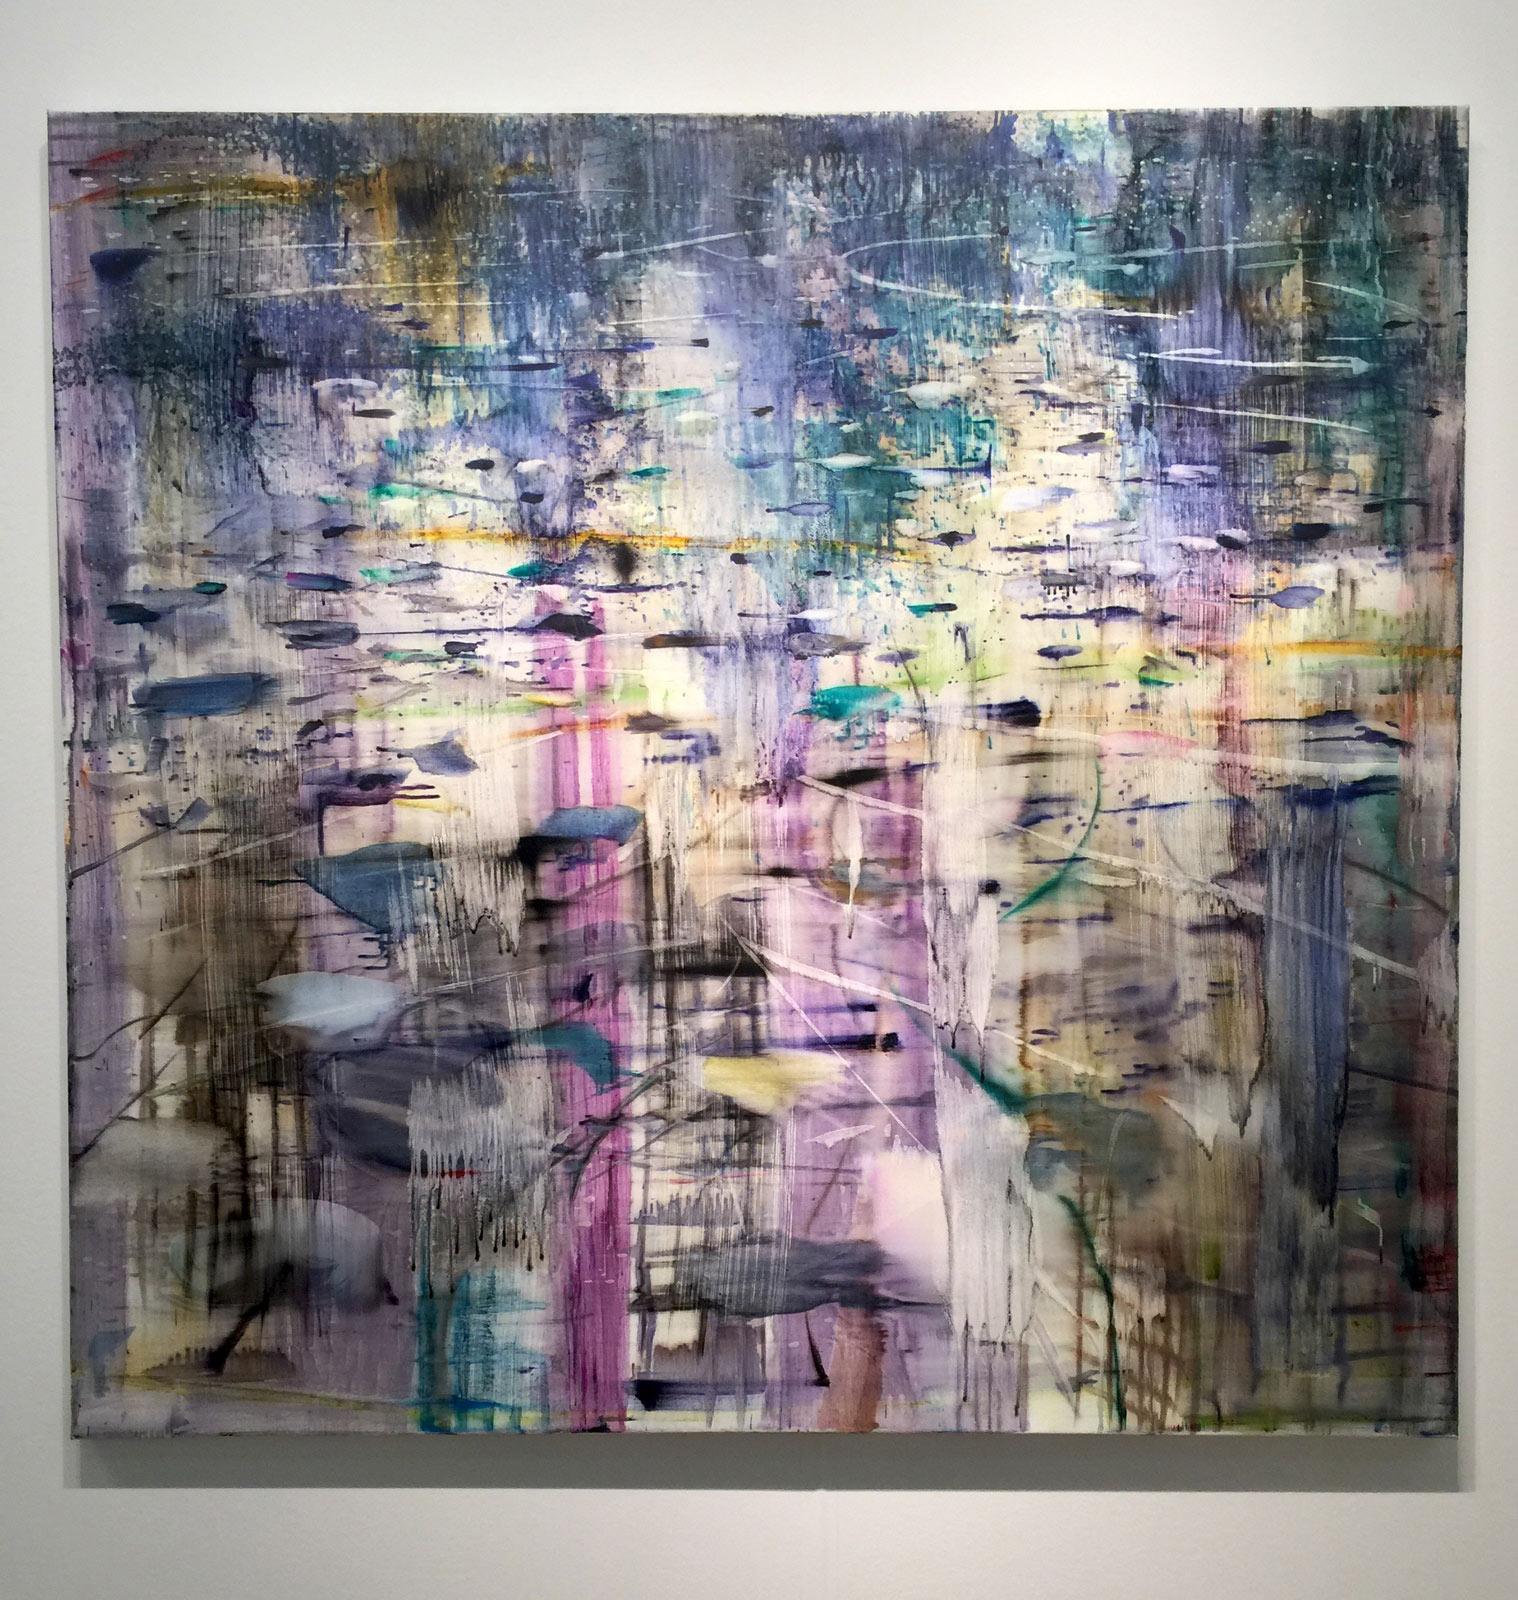 Matthias-Meyer-the-Pond-oil-canvas-Andreas-Binder-gallery.jpg